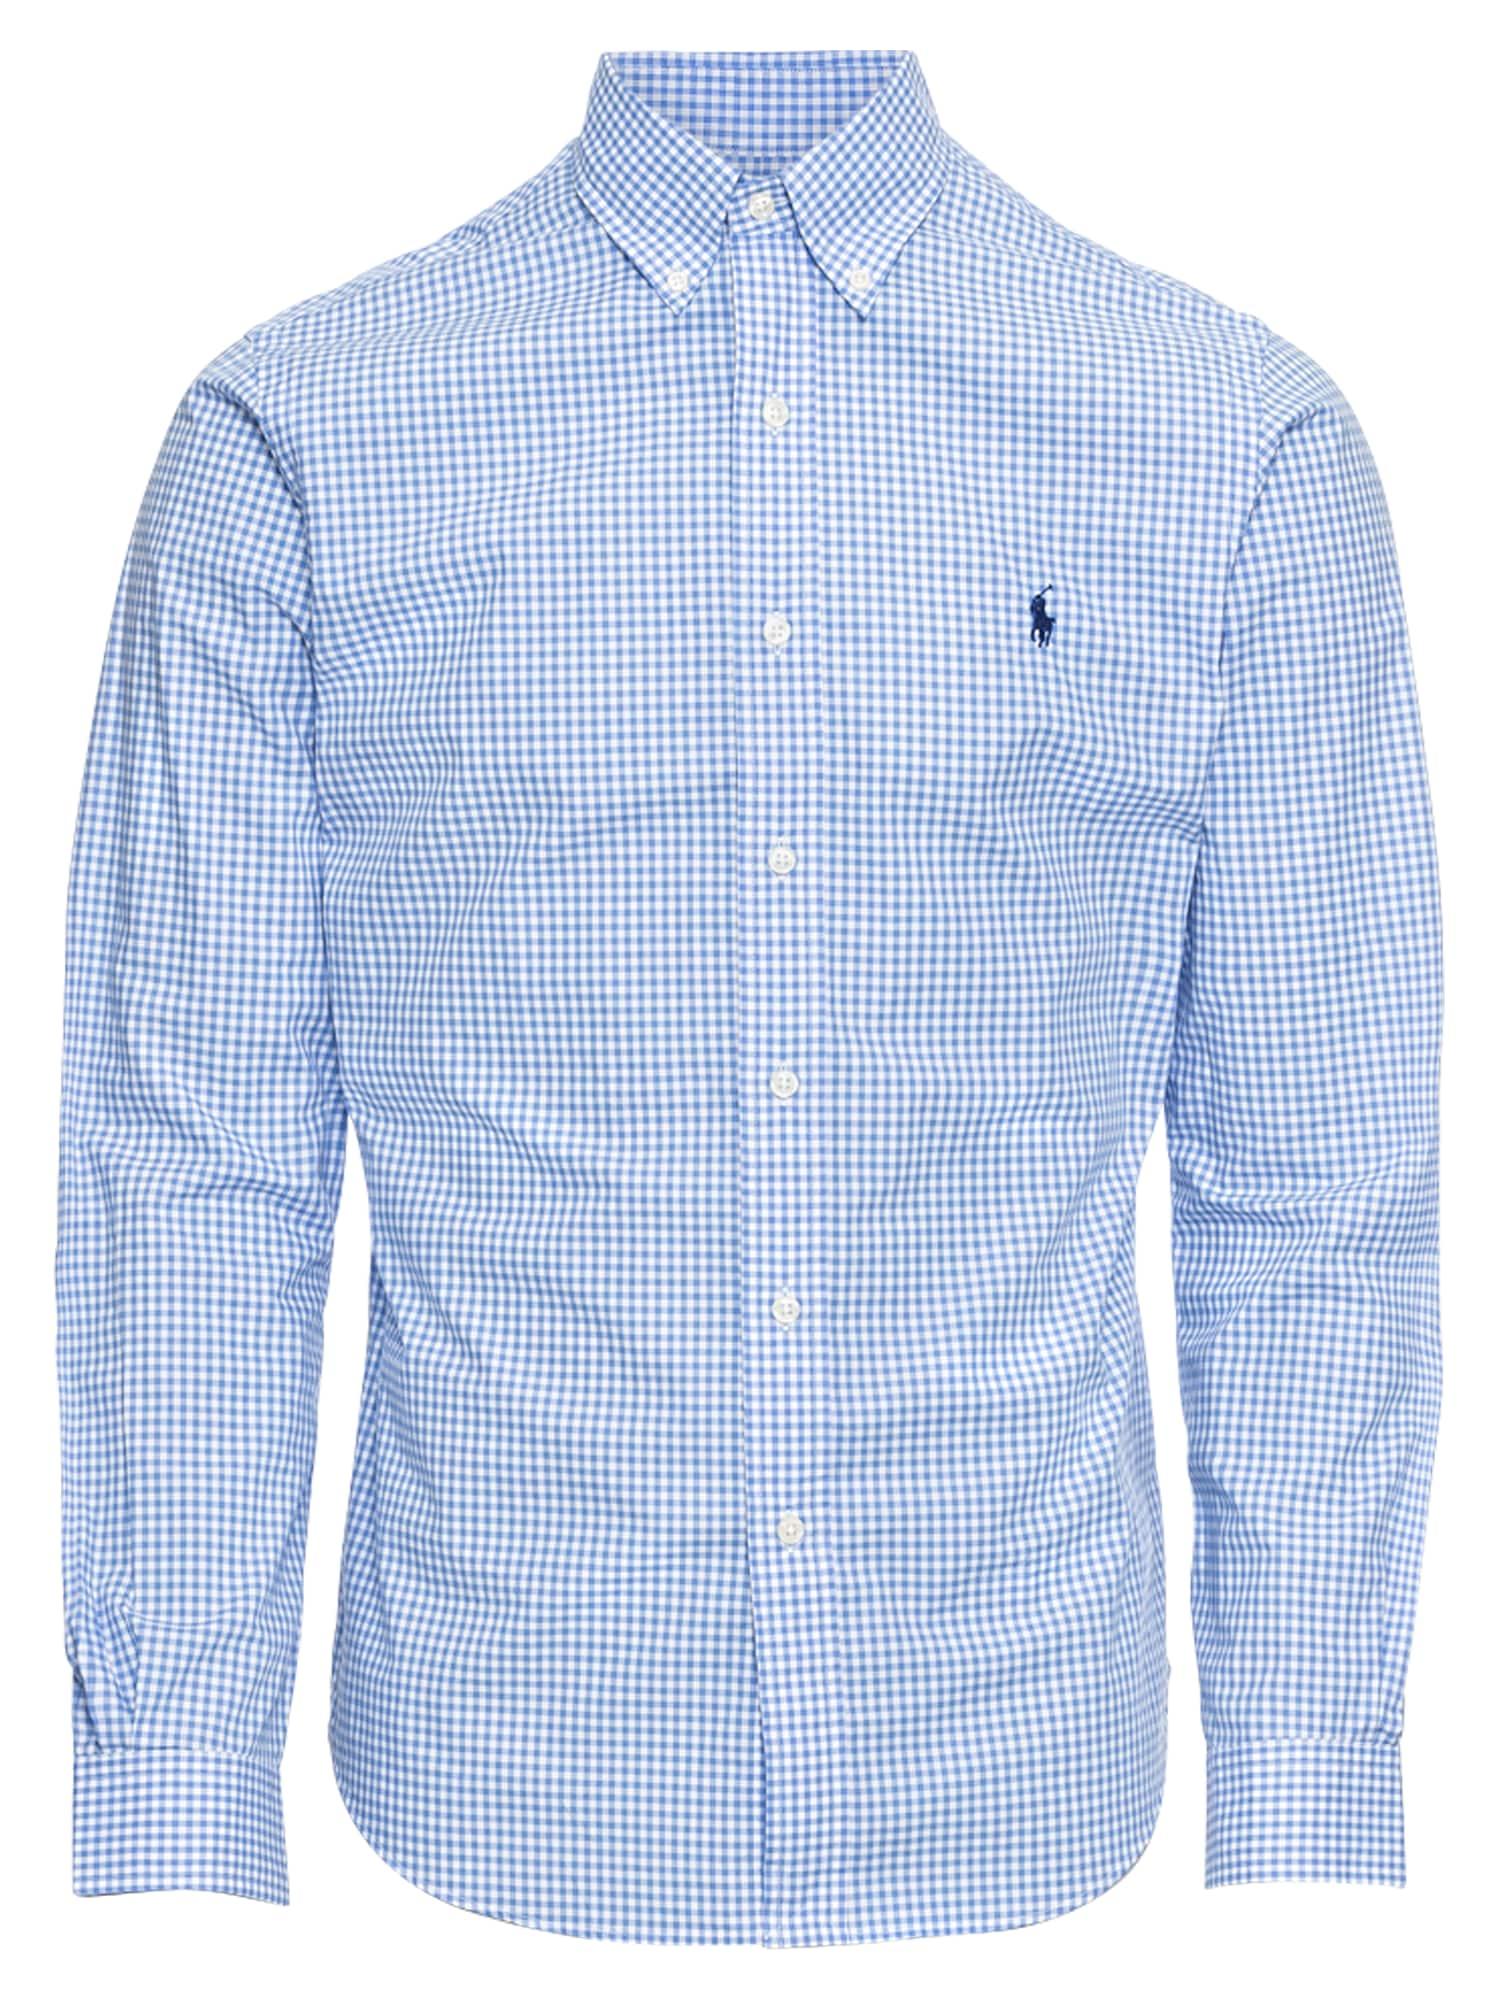 POLO RALPH LAUREN Dalykiniai marškiniai 'SL BD PPC SP-LONG SLEEVE-SPORT SHIRT' mėlyna / balta